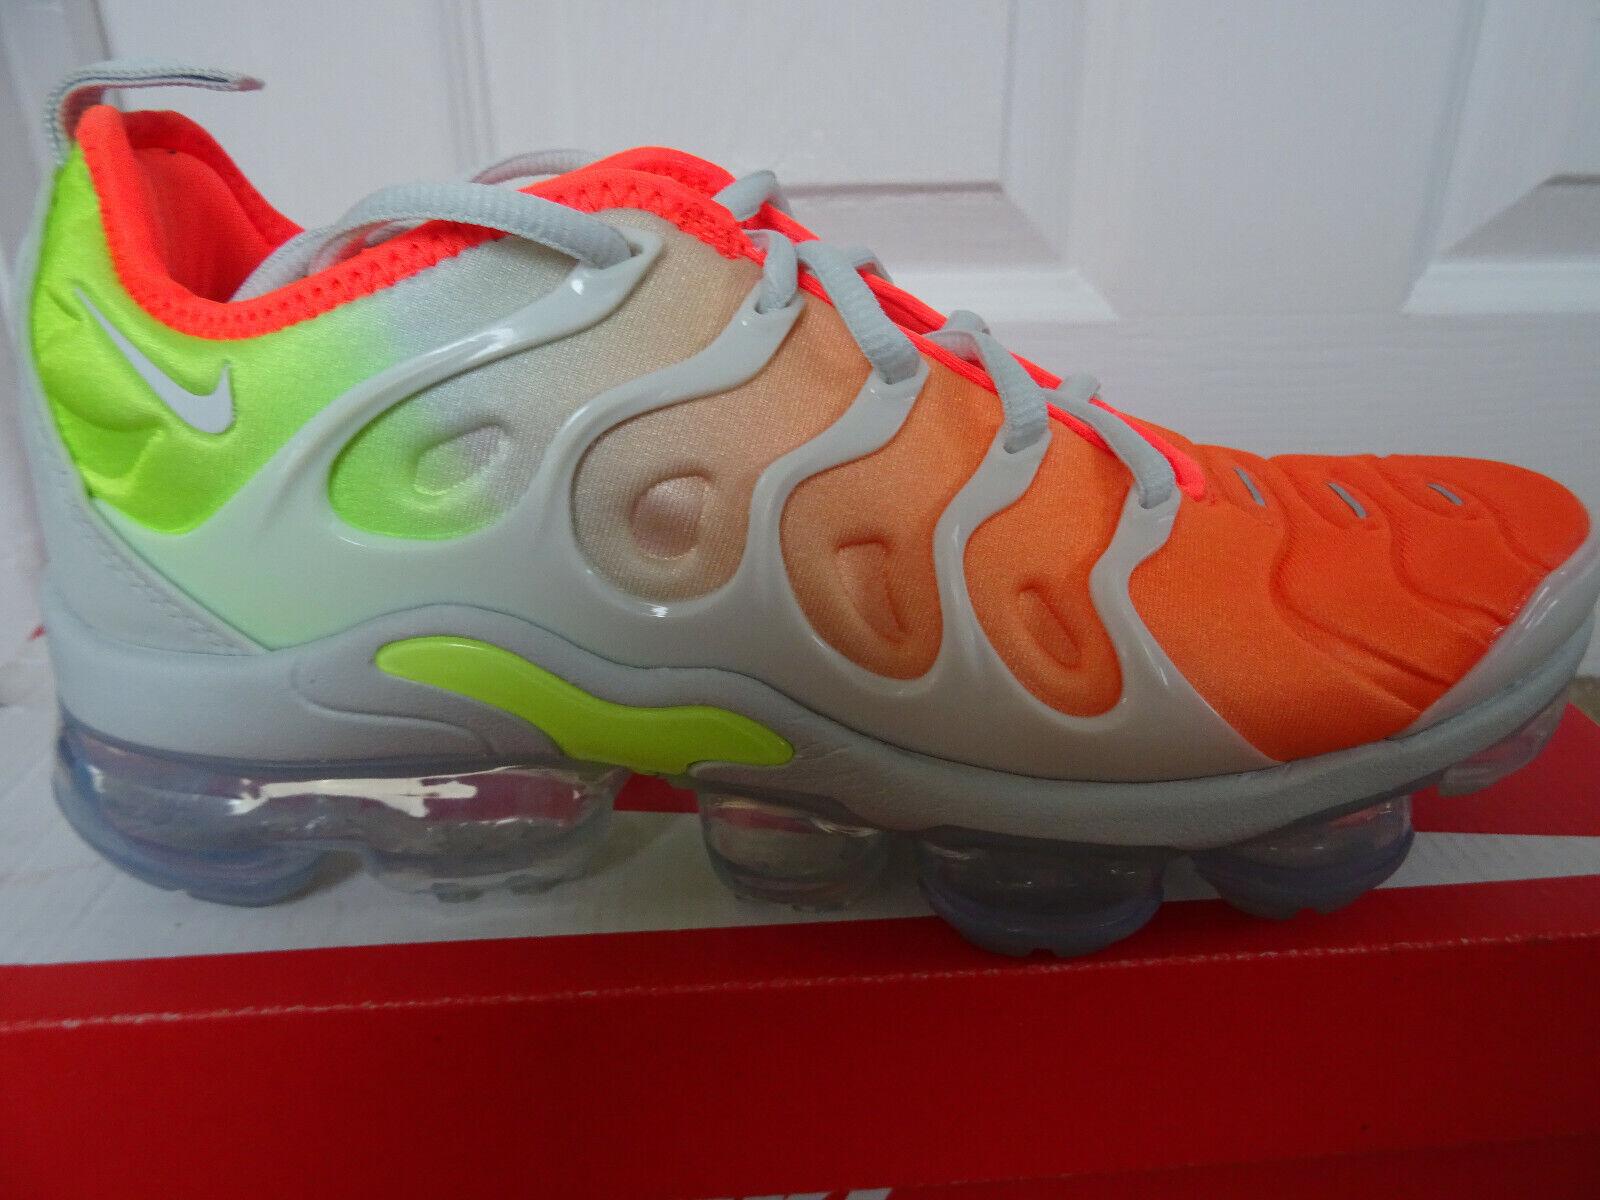 Nike Air Vapormax Plus wmns trainers shoe AO4550 003 uk 4 eu 37.5 us 6.5 NEW+BOX